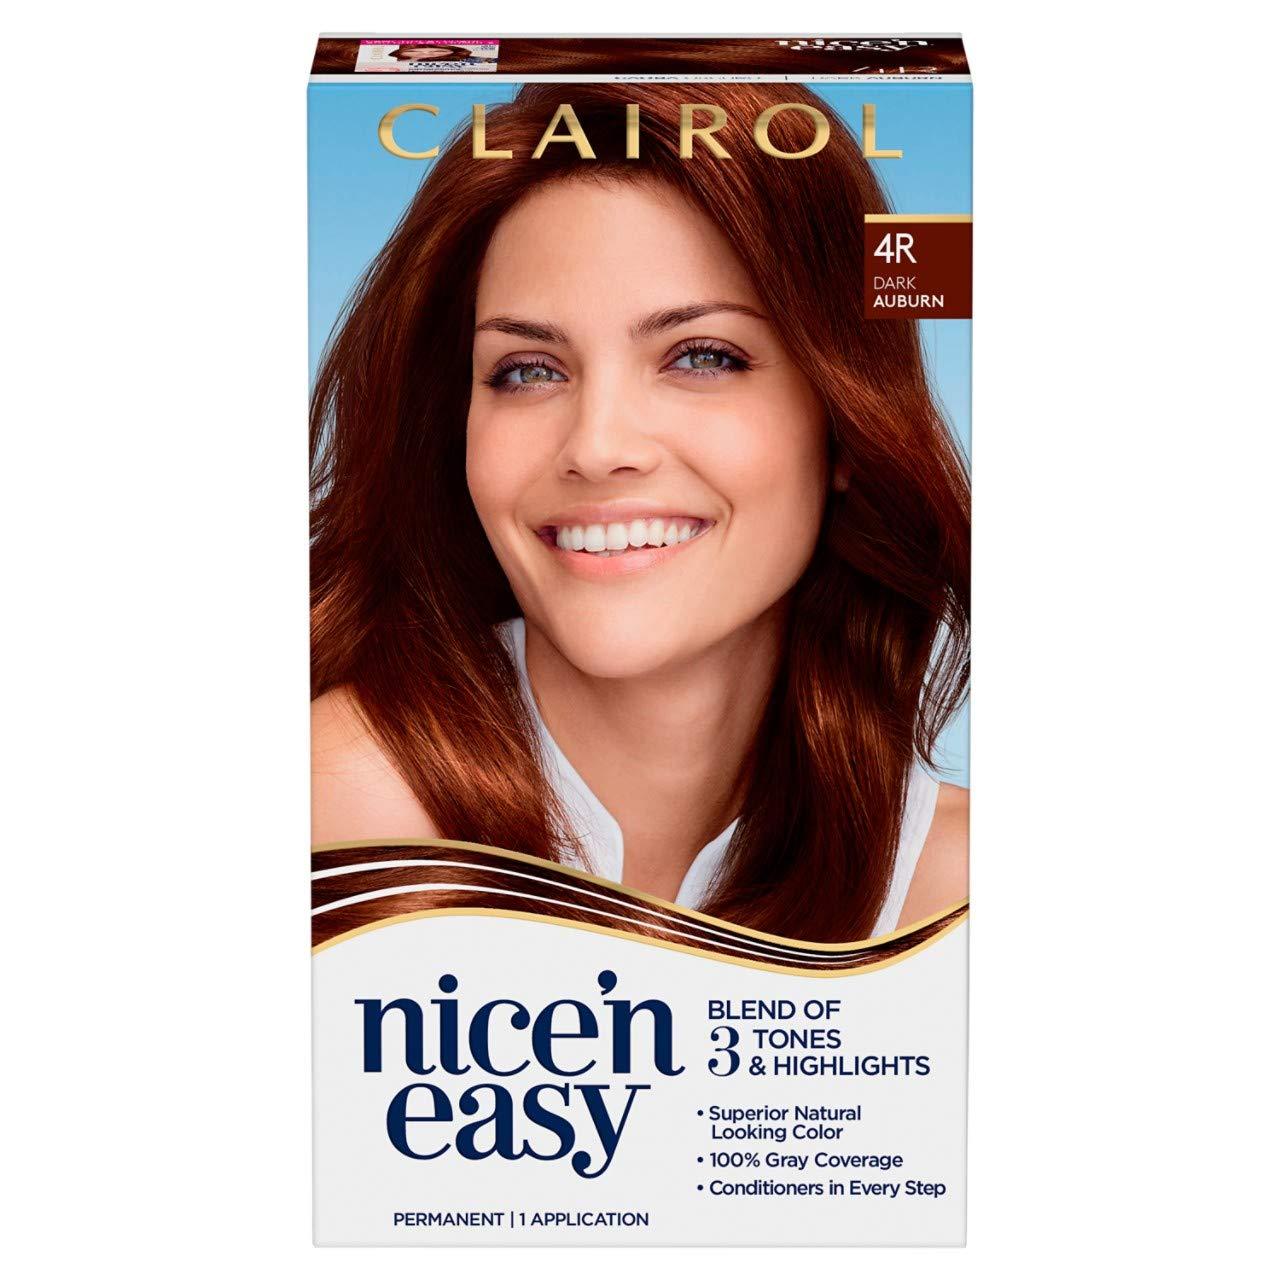 Clairol Nice'n Easy Permanent Hair Color, 155R Dark Auburn, 15 Count